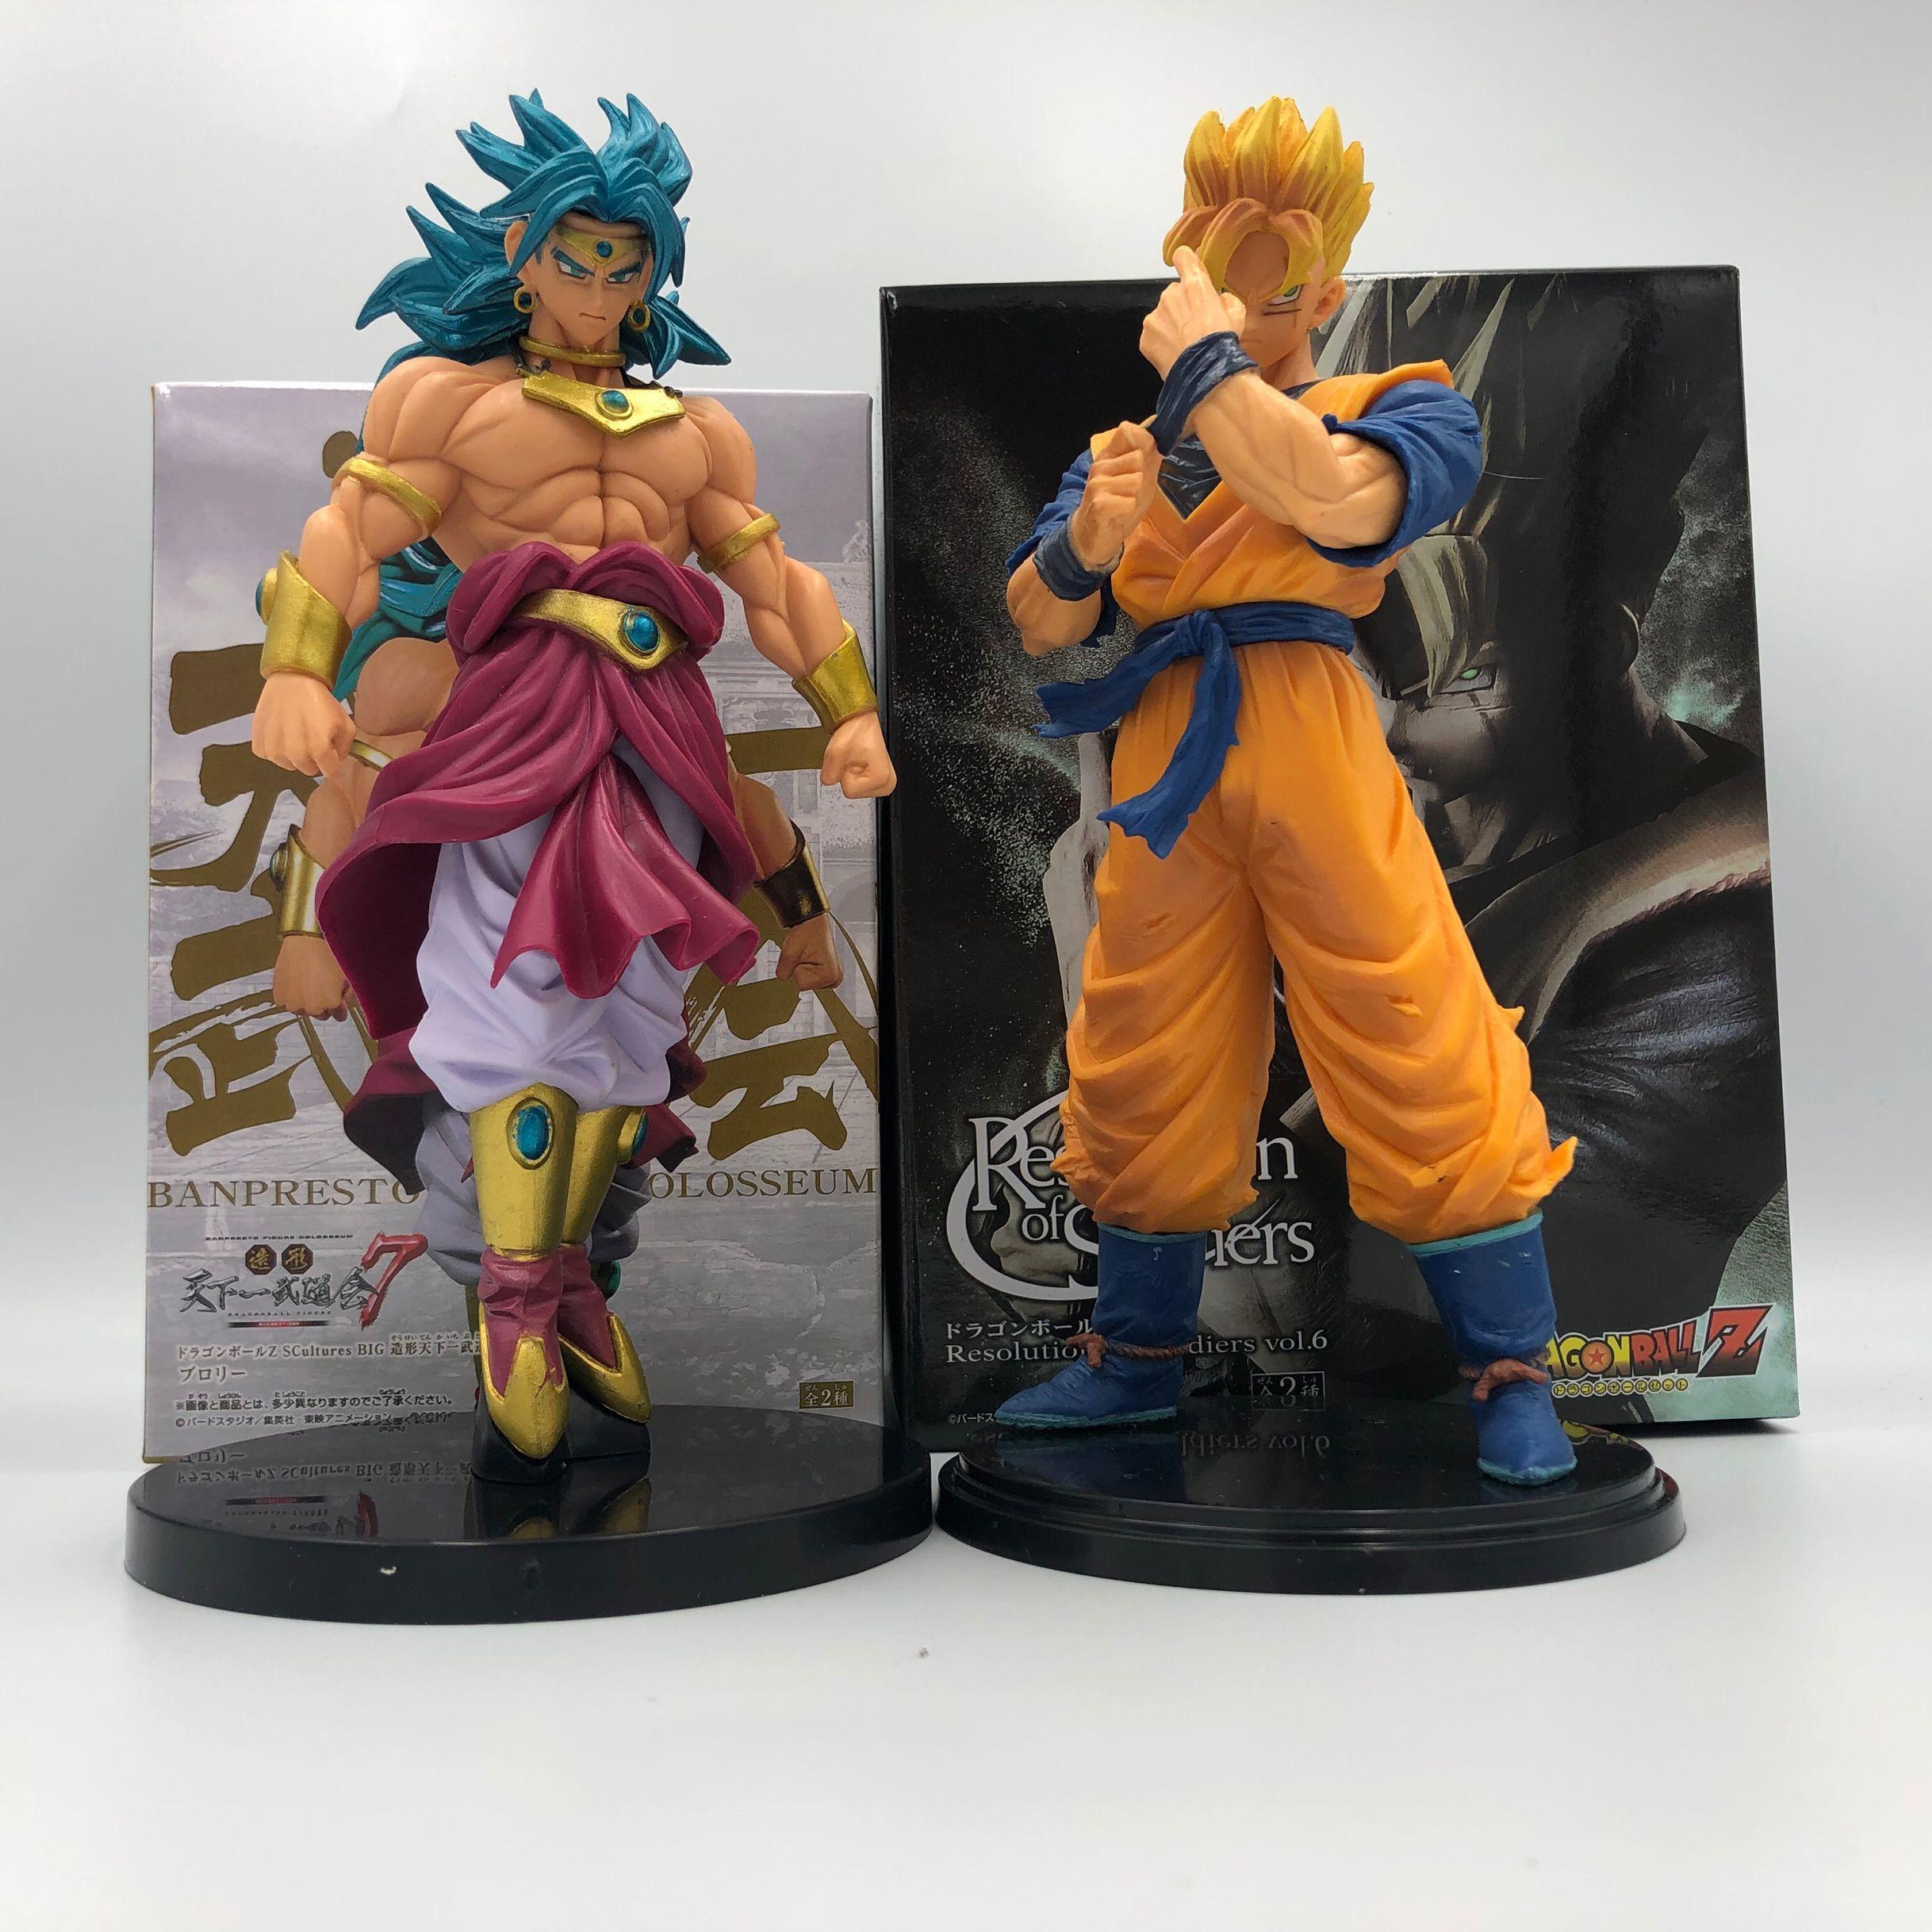 21 cm Brolly Dragon Ball Z Broly Gohan Toy Figure Super Saiyan Anime DBZ Tenkaichi Budokai Toy Collectible MX191105